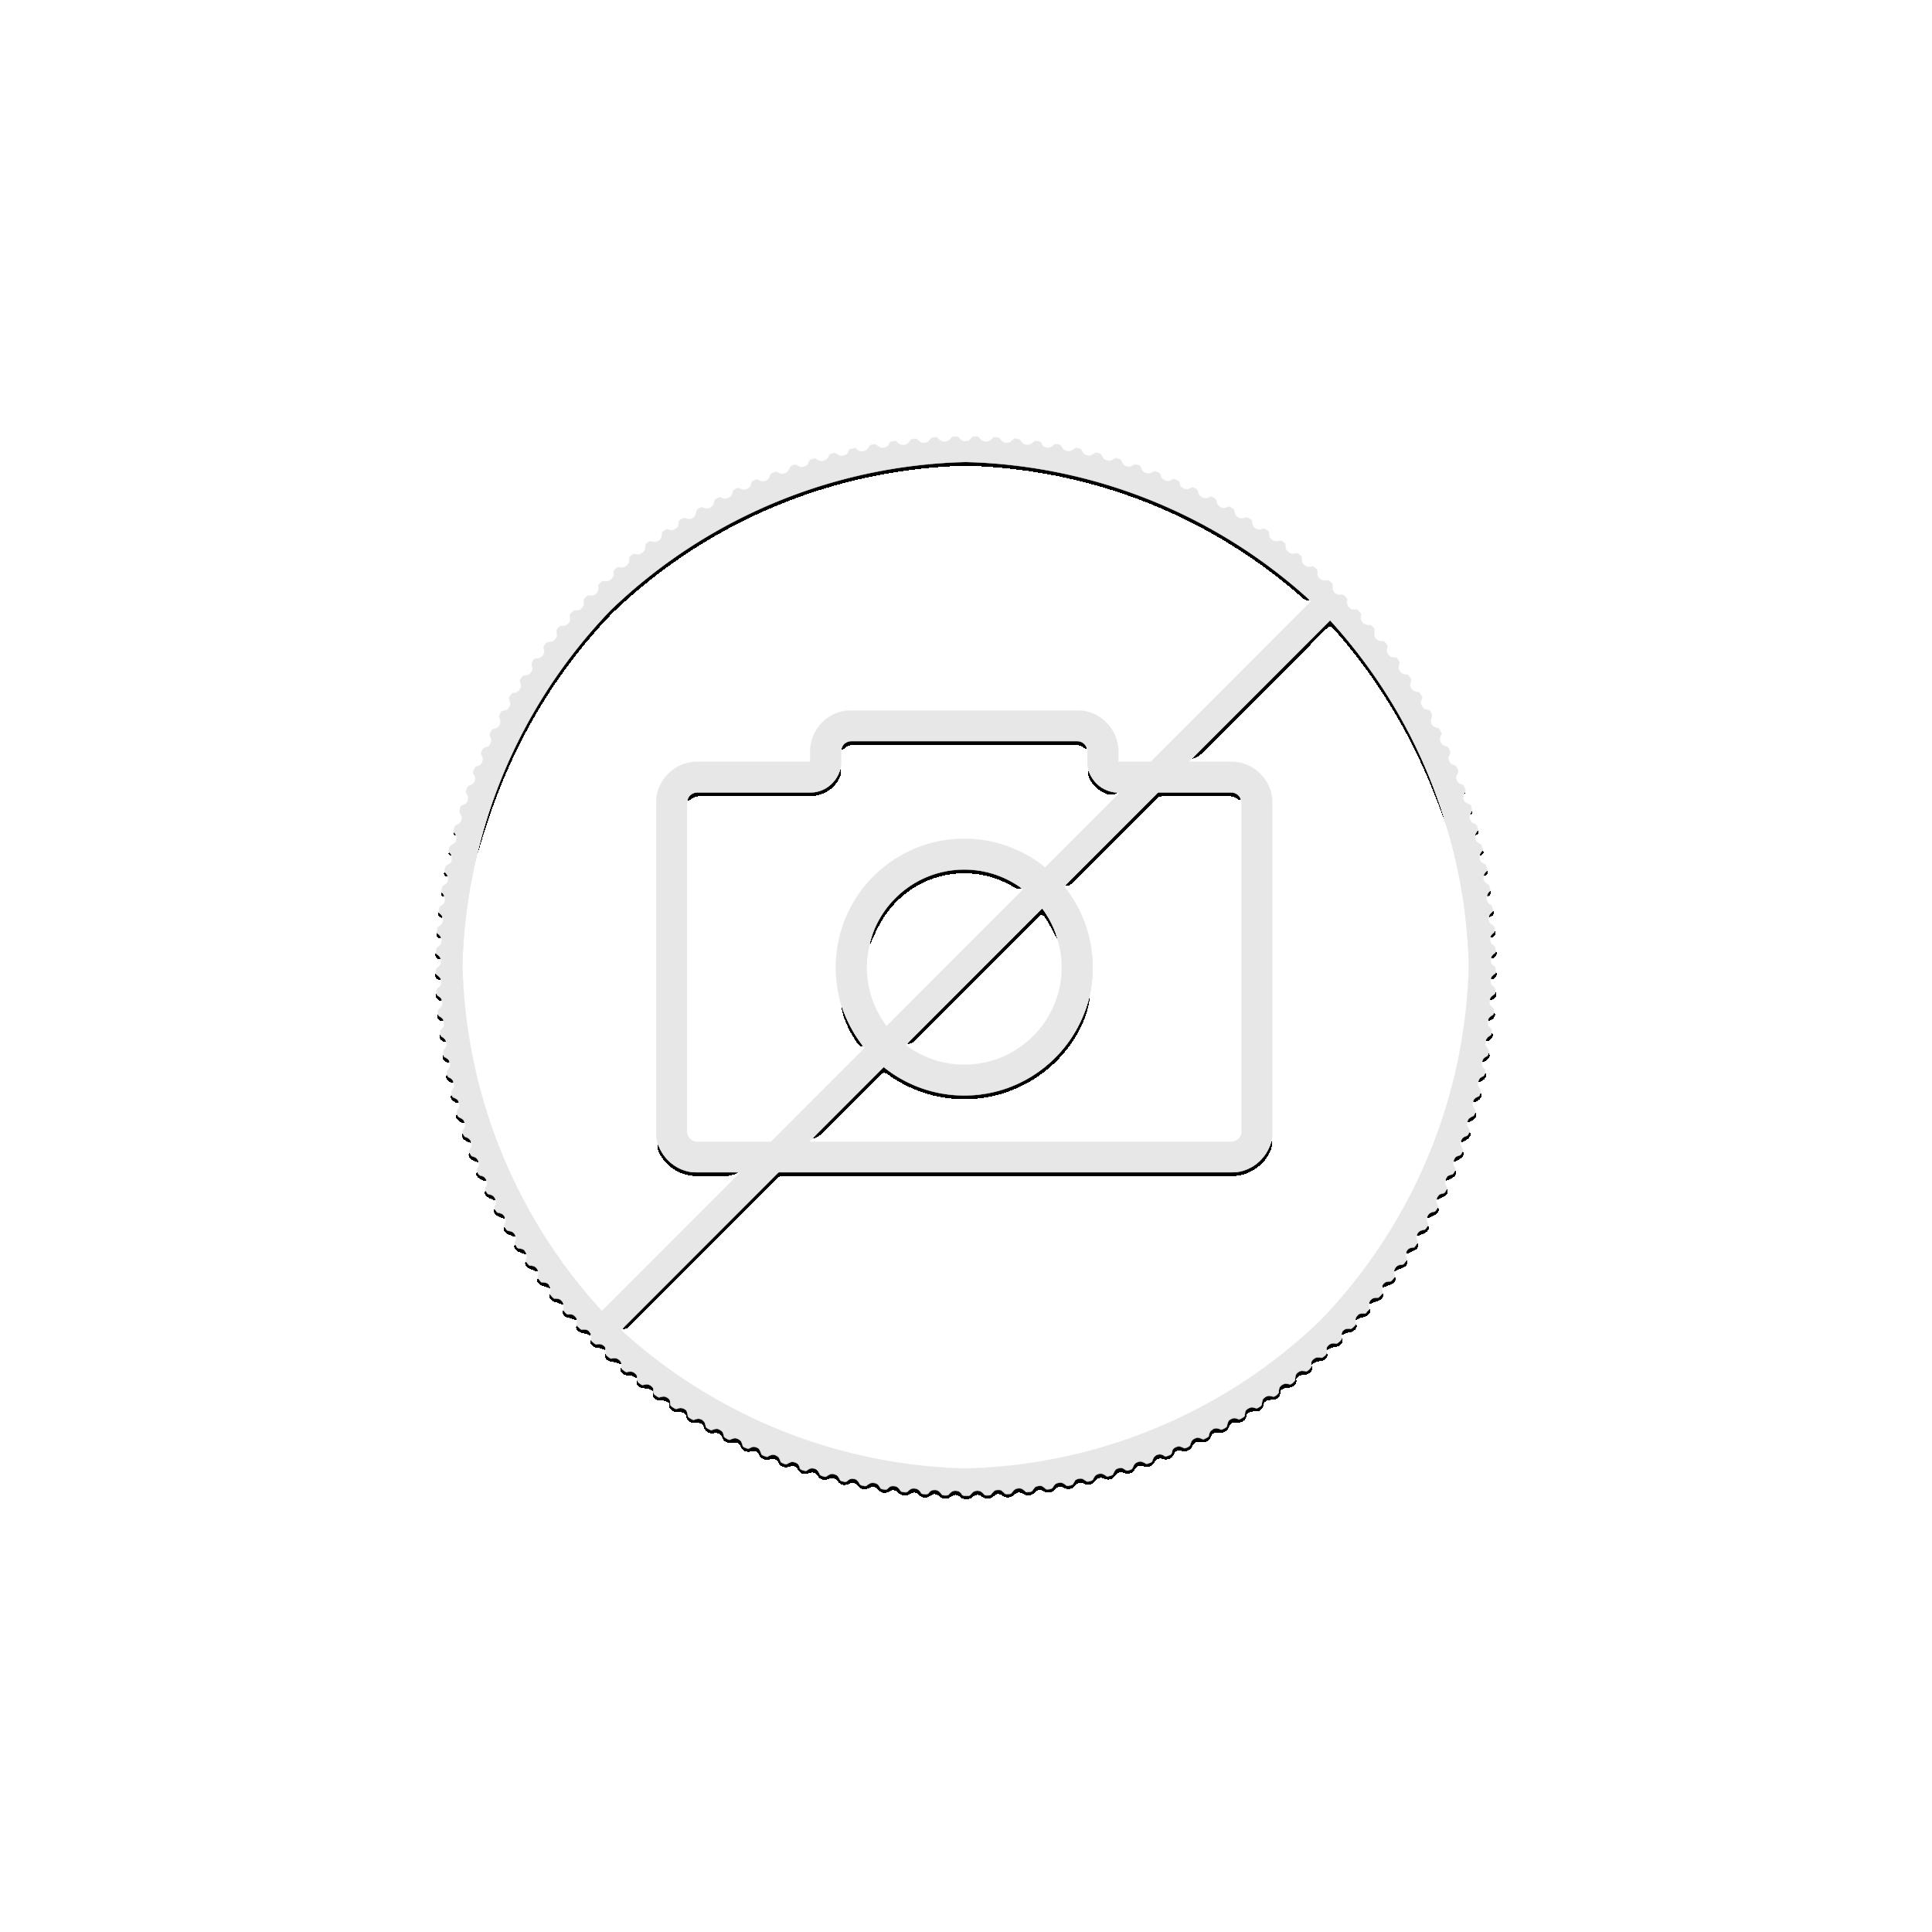 1 troy ounce gold Britannia coin